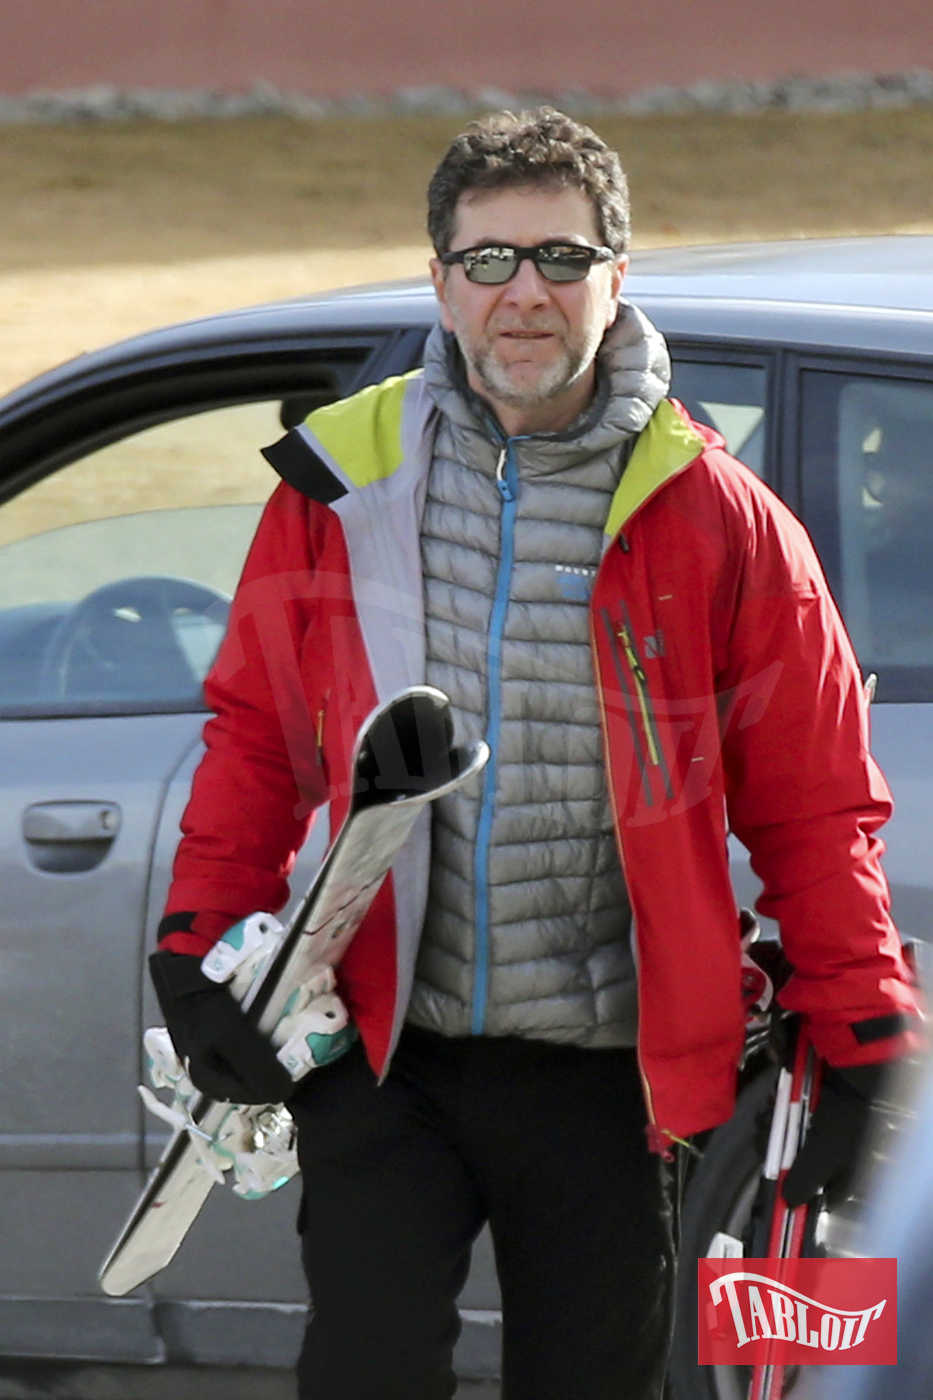 Fabio Fazio fotografato a St. Moritz lo scorso gennaio